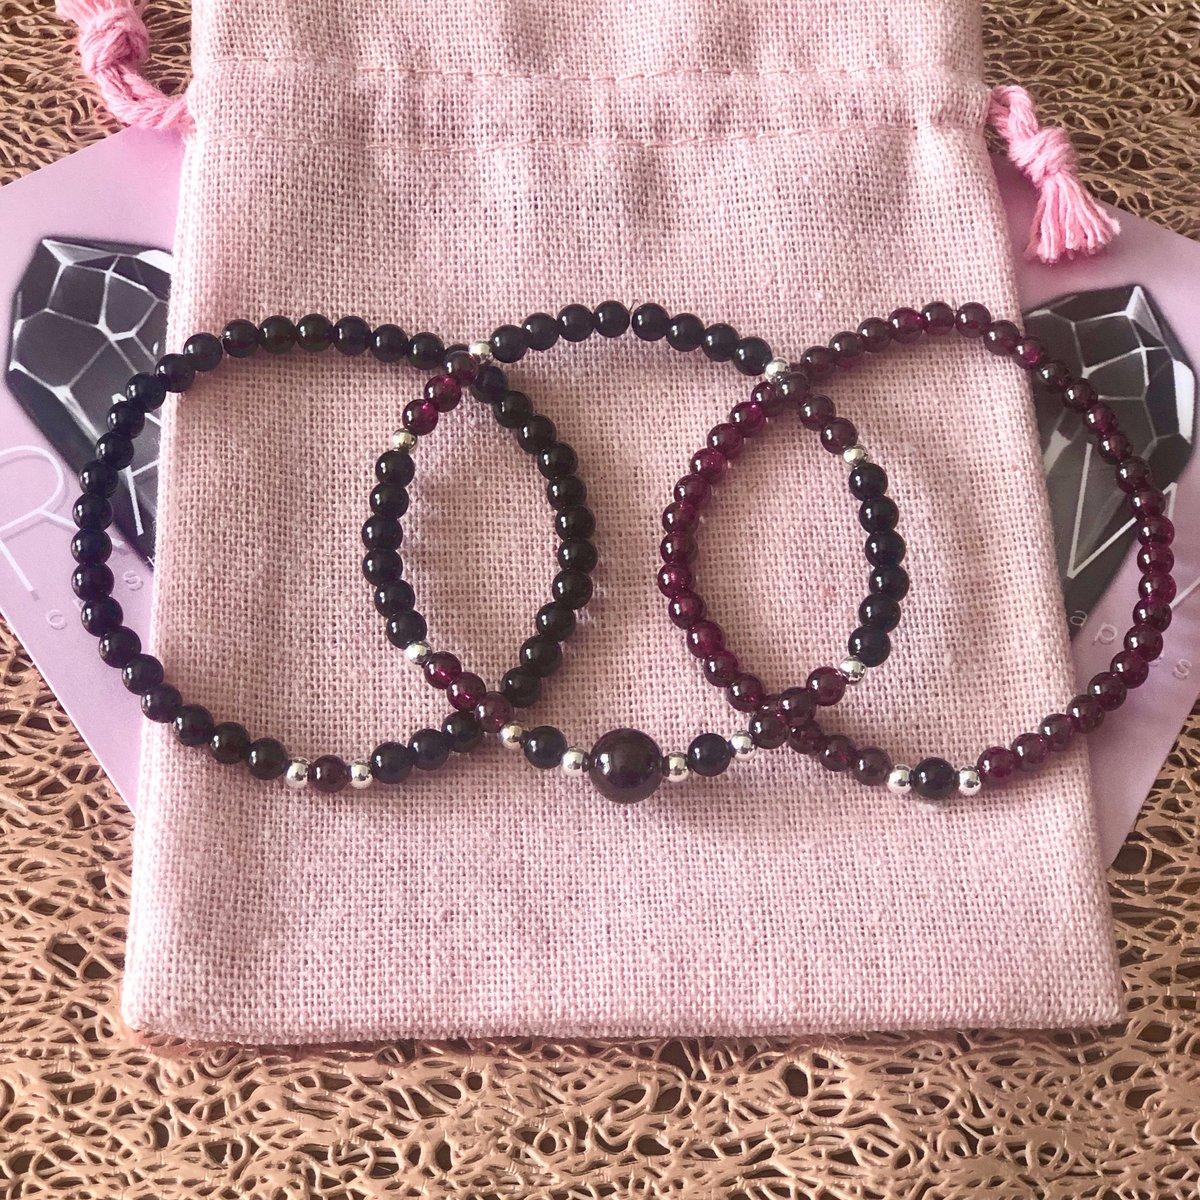 Garnet & Onyx skinny stackers. Sold as a set #crystals #gemstones #semipreciouspic.twitter.com/6oGJQFkqmf